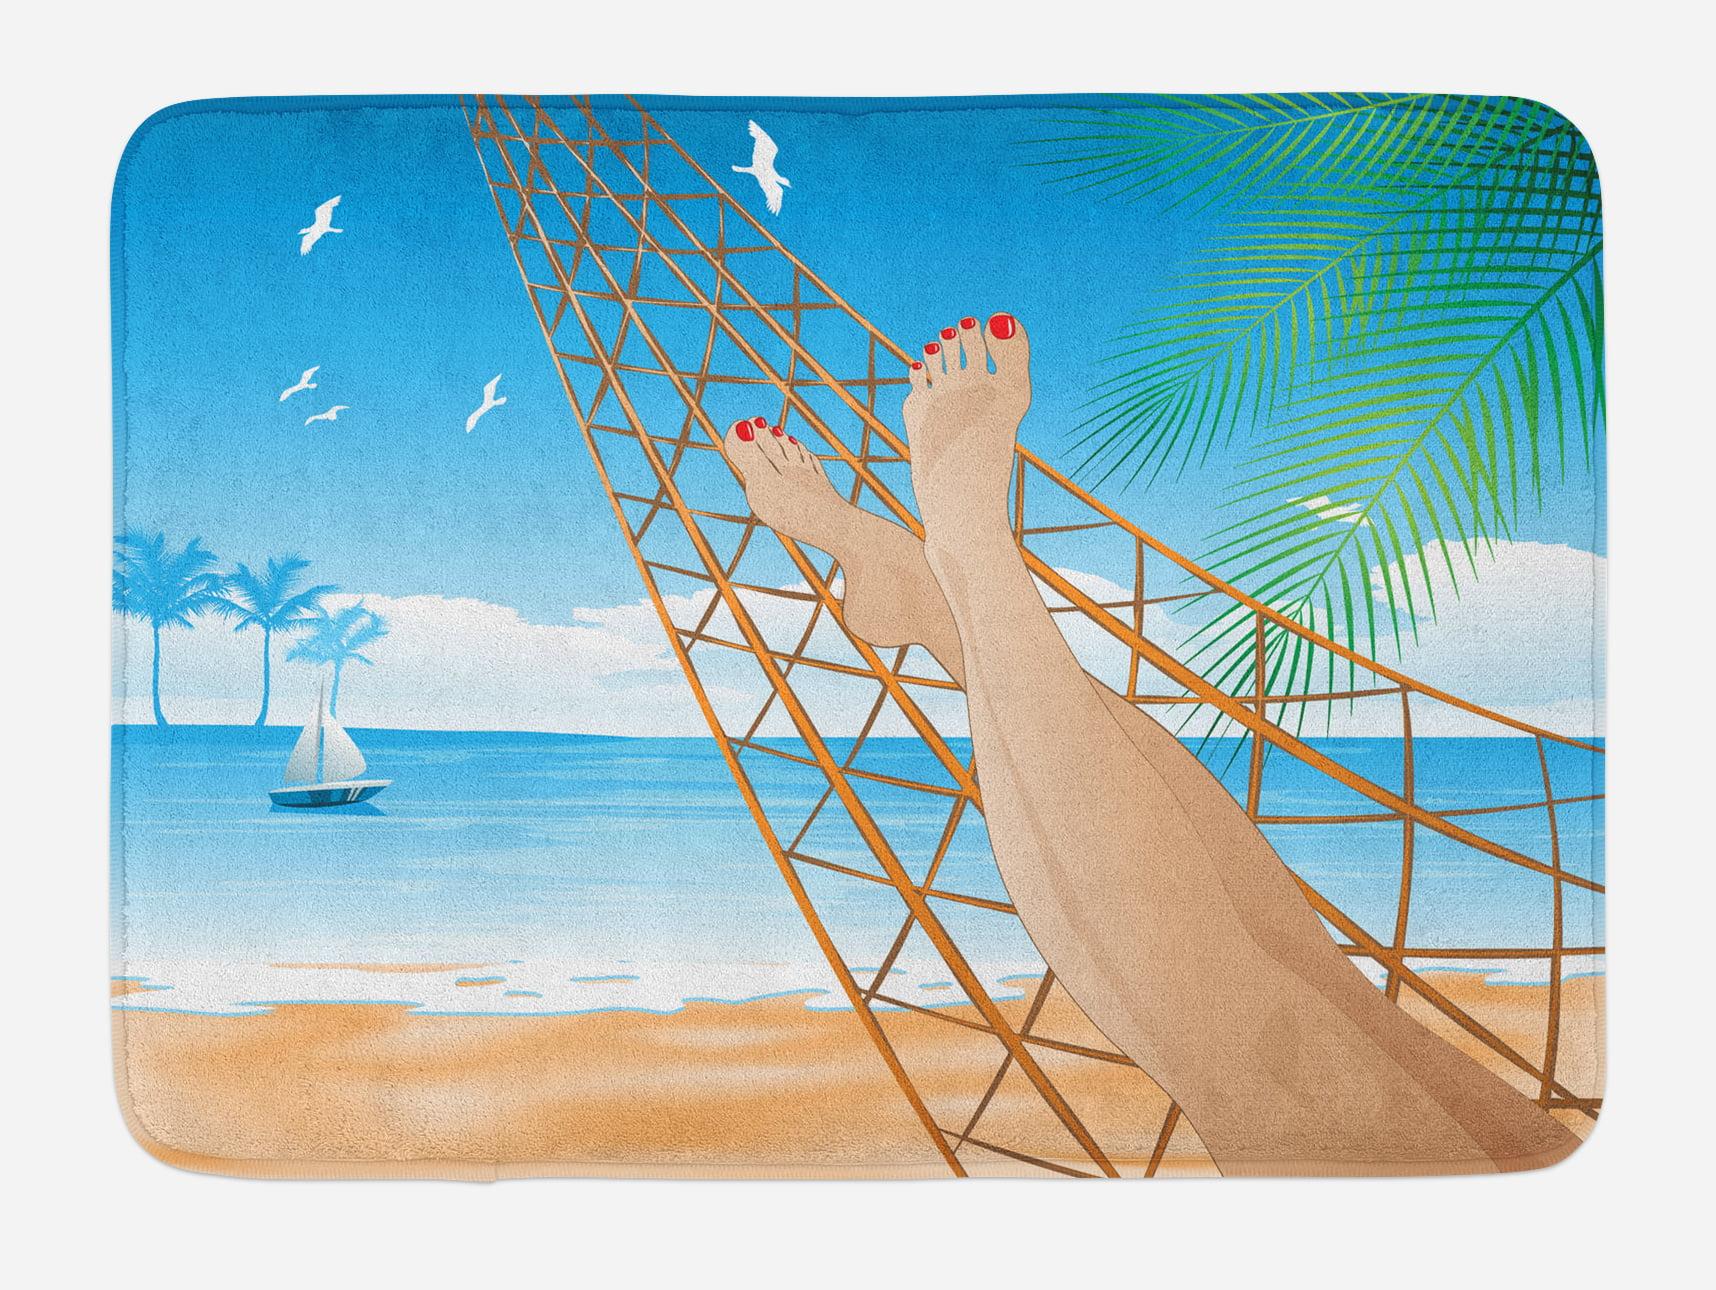 Beach Bath Mat, Legs of the Sexy Lady Laying in the Hammock toward the Ocean in Hawaiian Tropical, Non-Slip Plush Mat... by 3decor llc